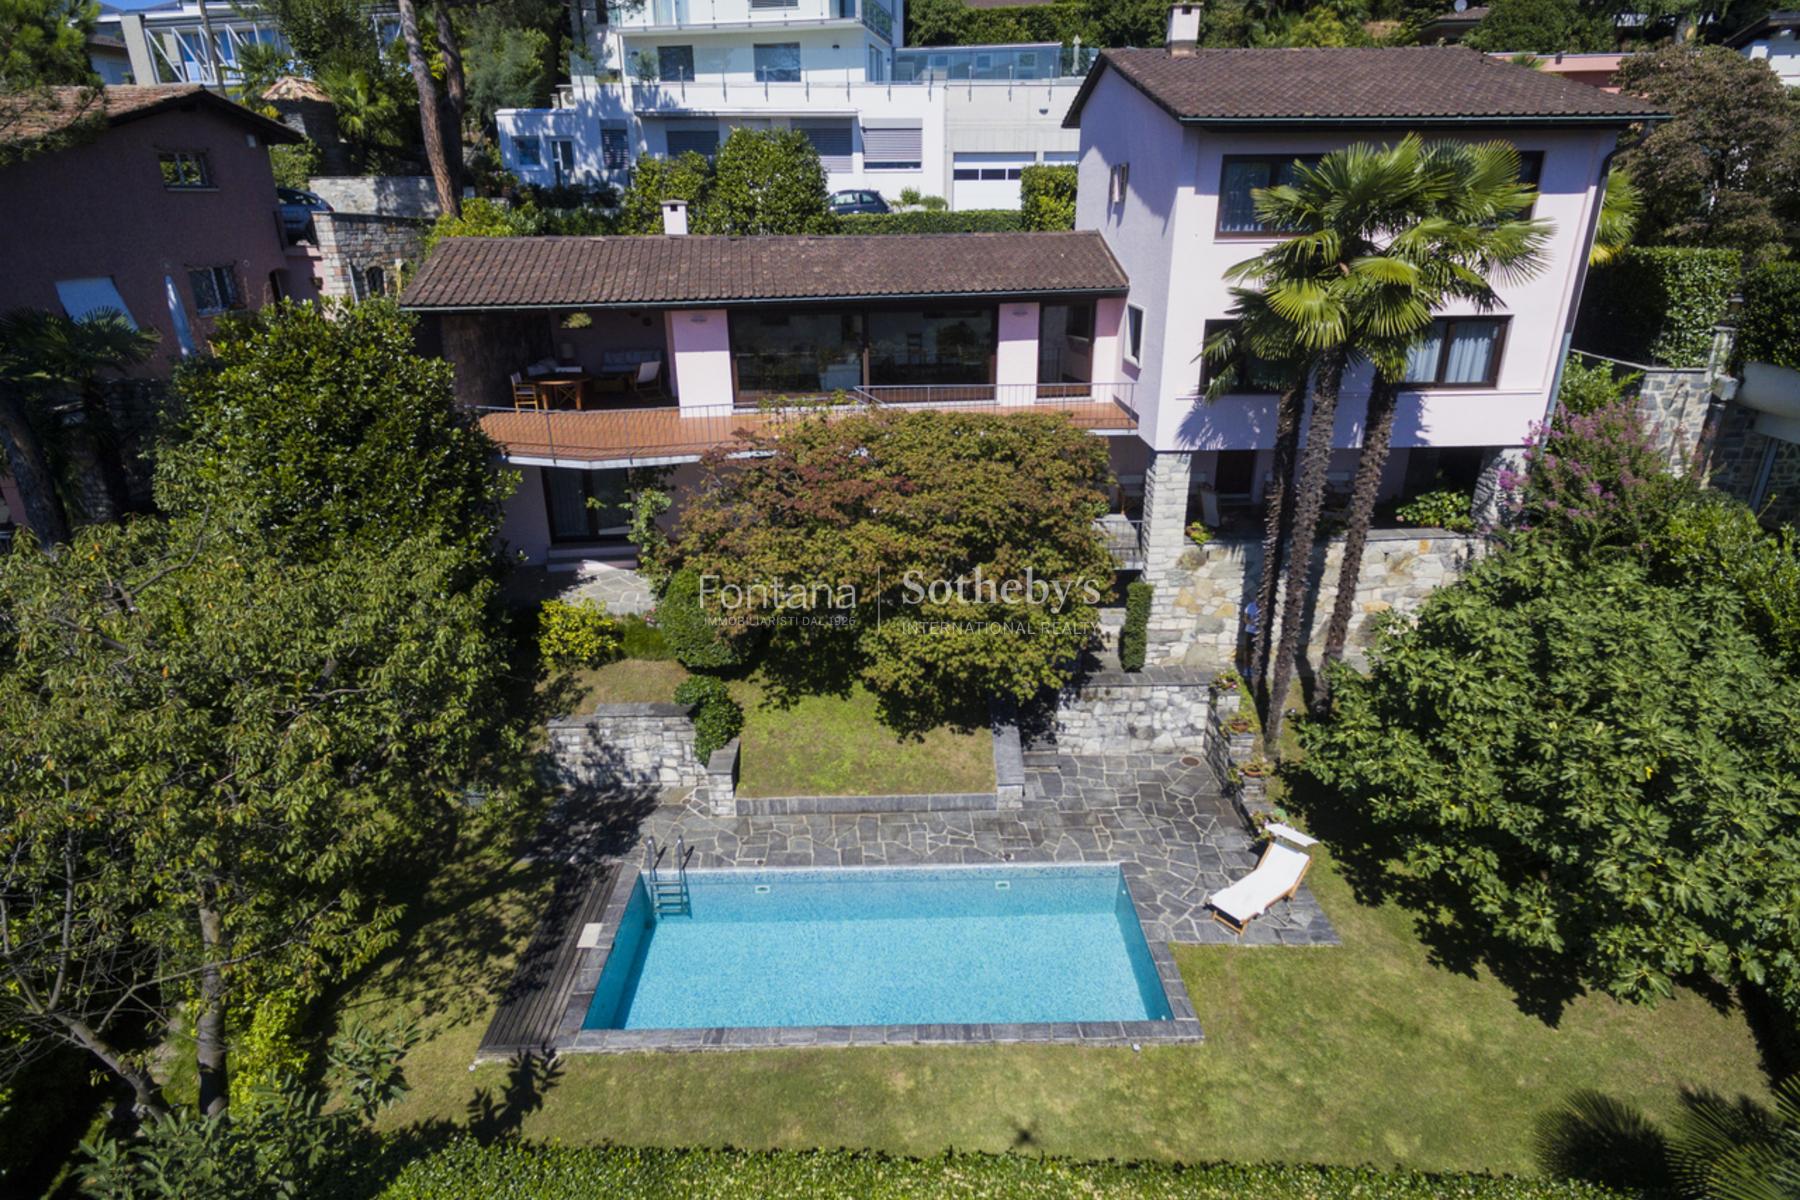 Частный односемейный дом для того Продажа на Exclusive villa with swimming pool and lake view Savosa Savosa, Ticino, 6942 Швейцария